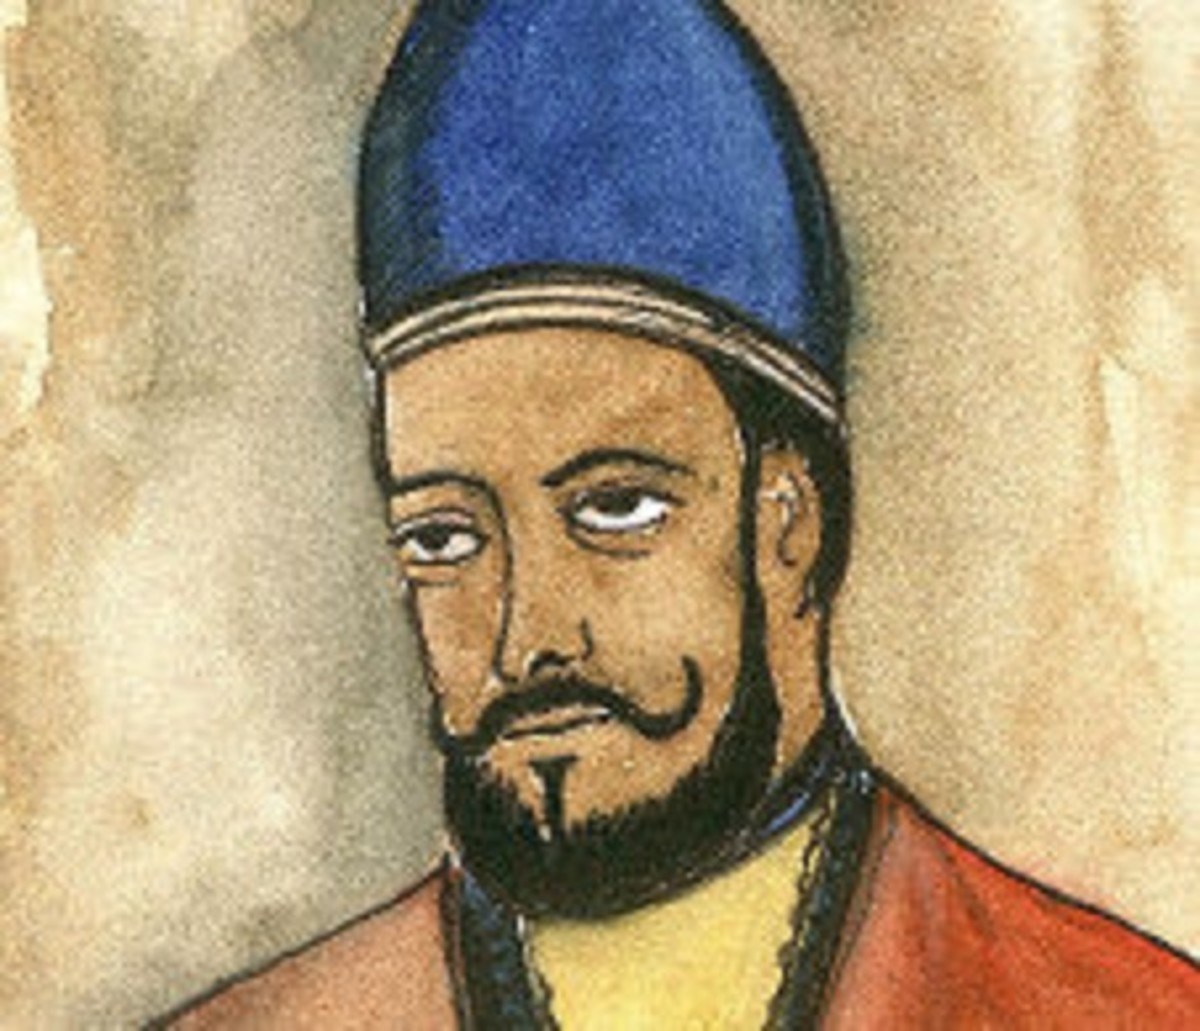 Qutub-ud-Din Aybak (206 - 1210)